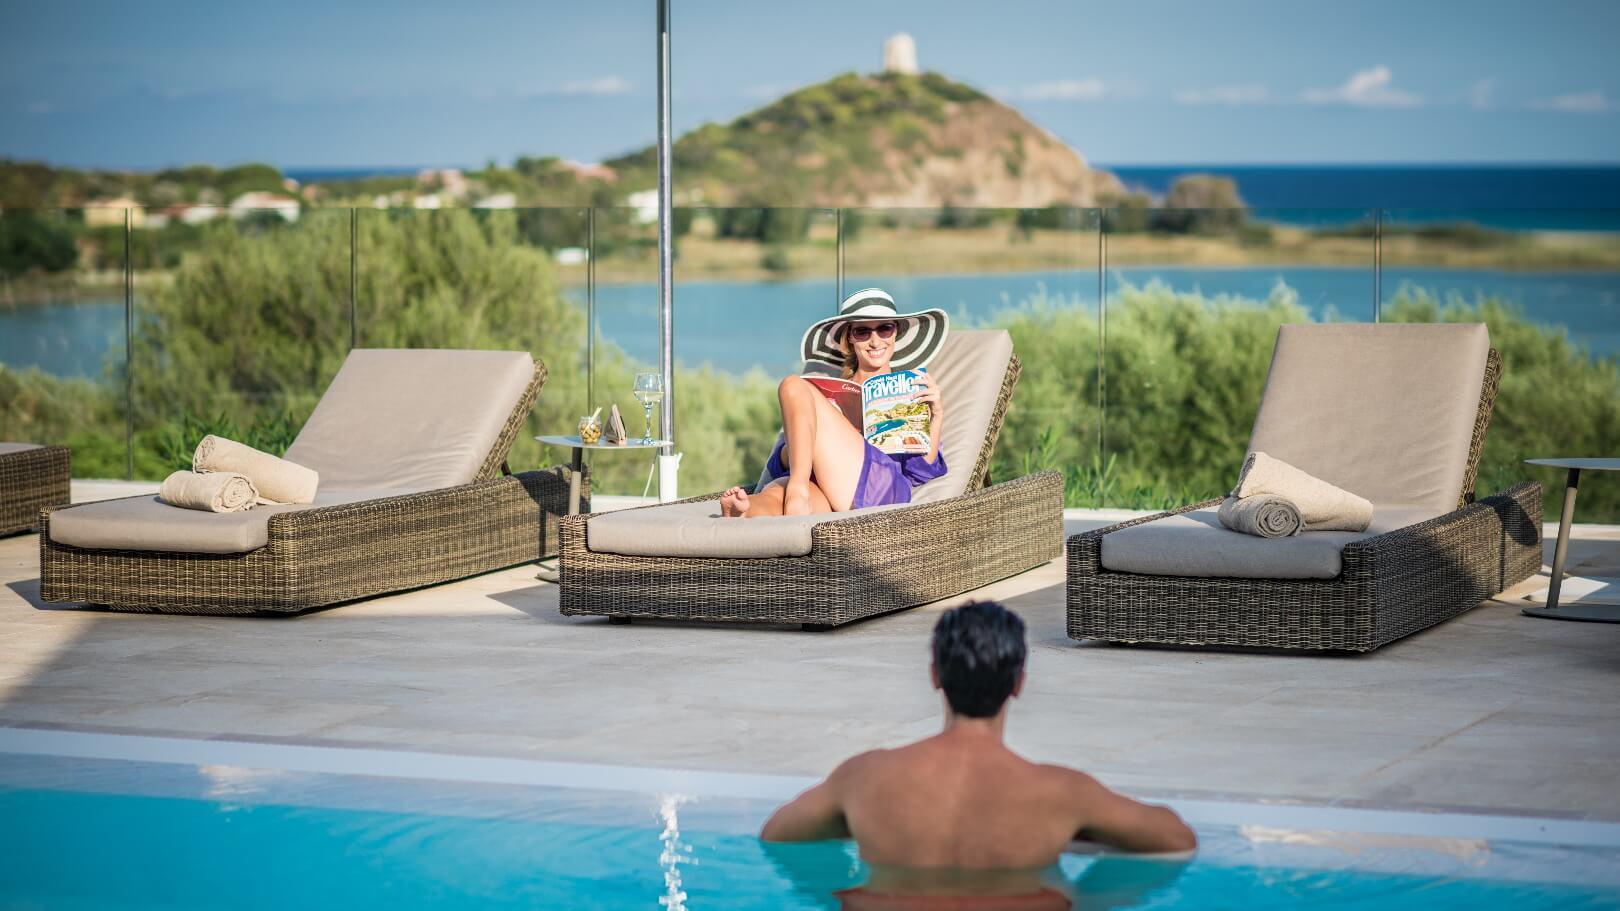 https://www.chialagunaresort.com/wp-content/uploads/2021/05/IHC_Chia-Laguna-Resort_grid_romantic_couple-pool-terrace.jpg